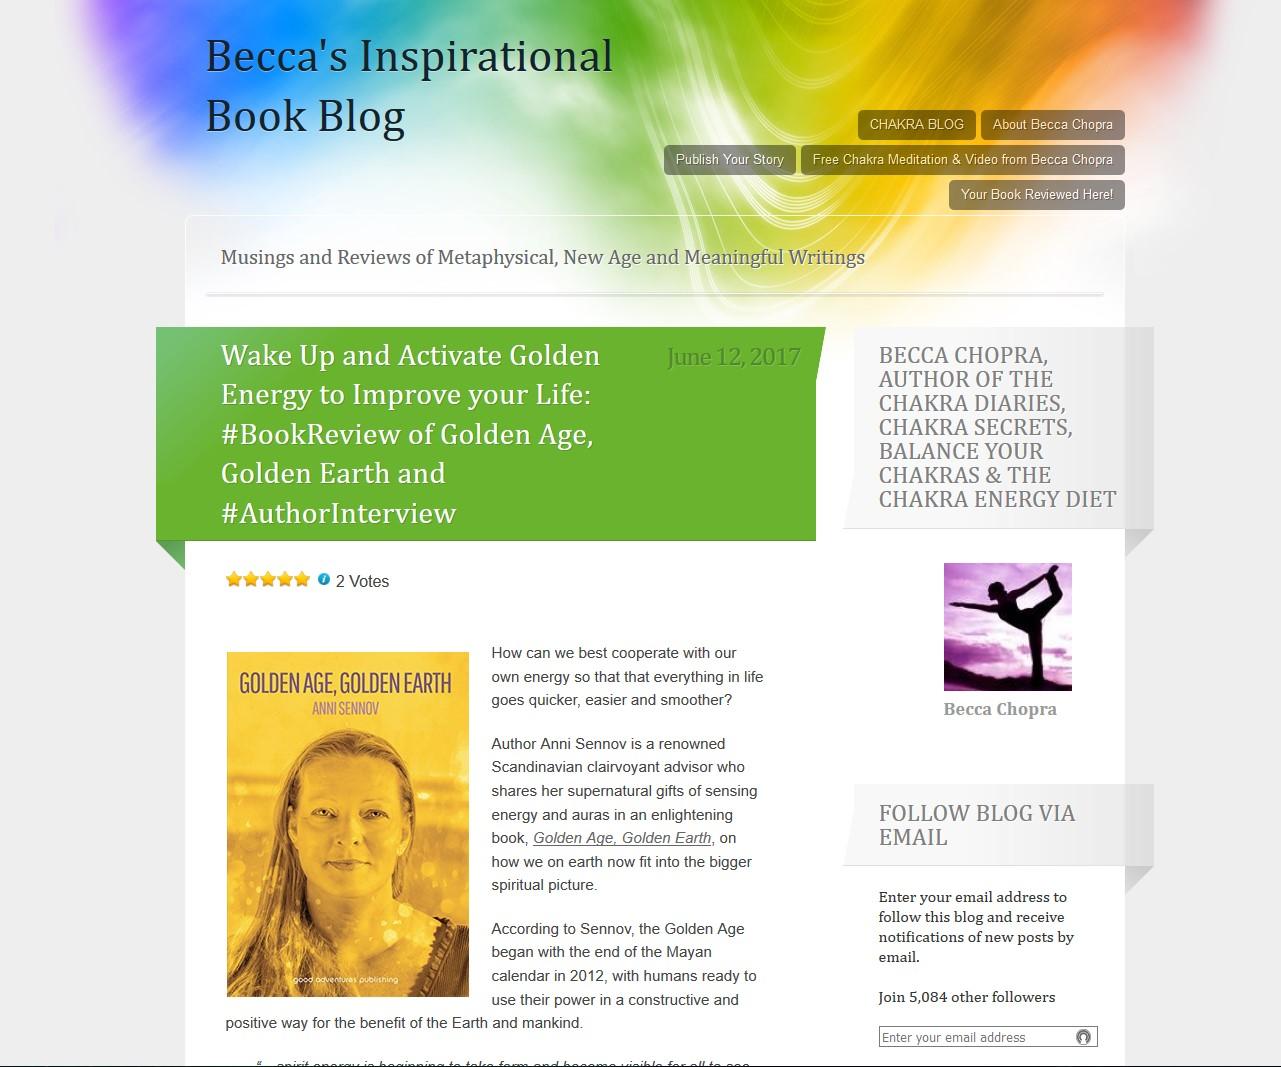 Becca's Inspirational Book Blog screenshot